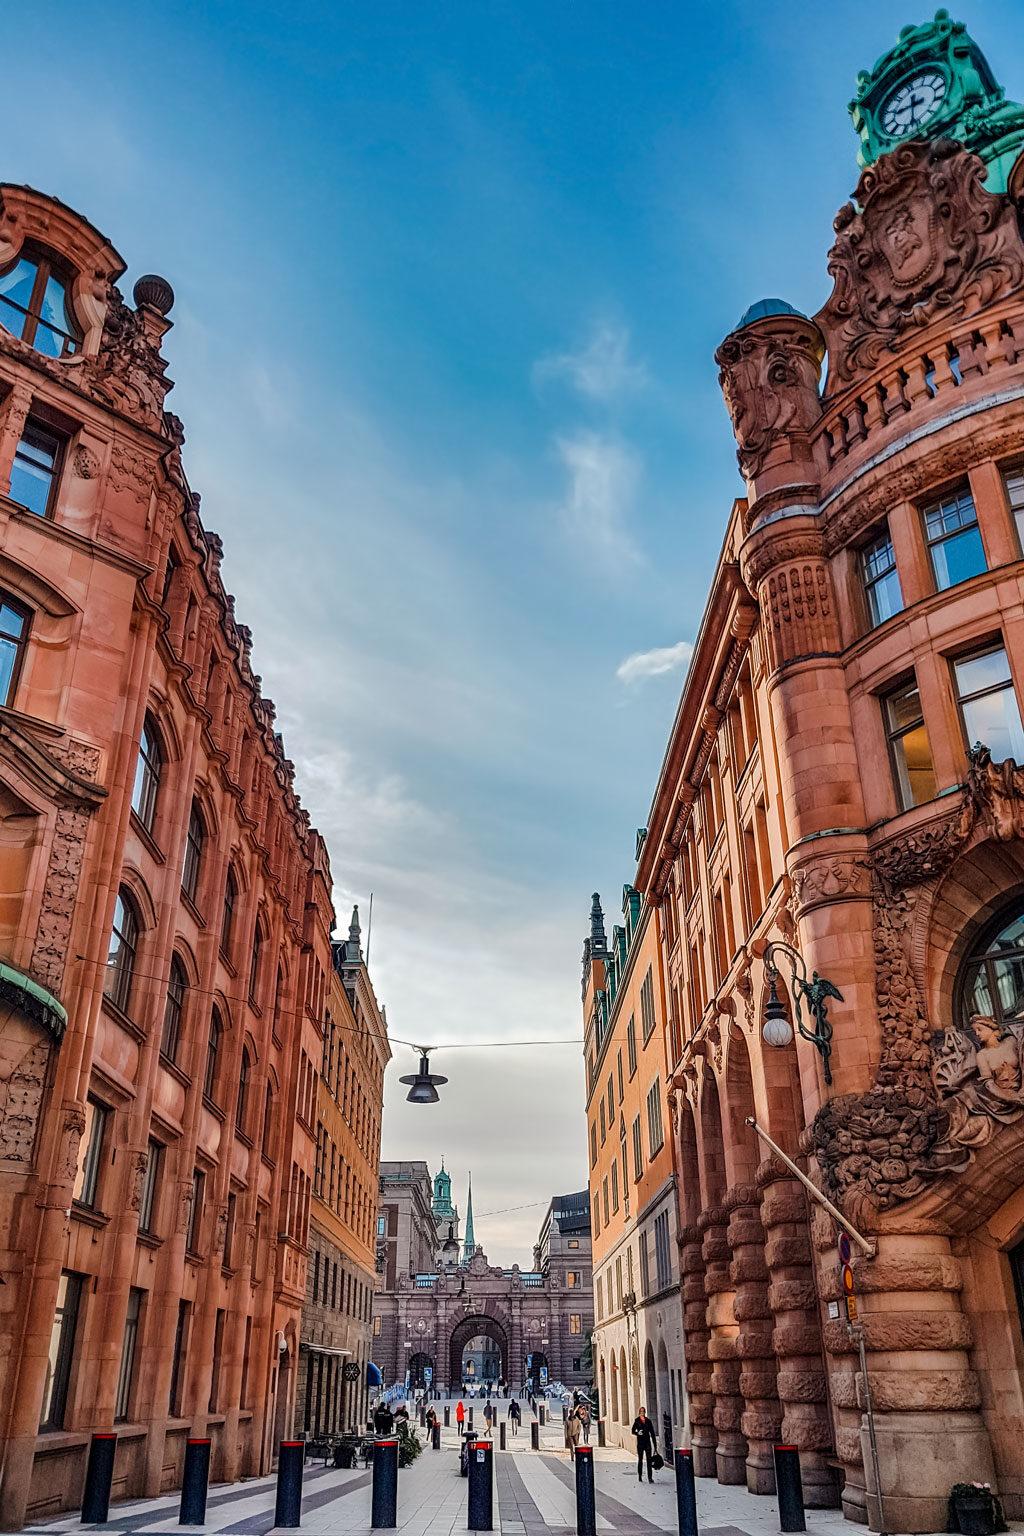 Stockholm City Centre Historical Buildings